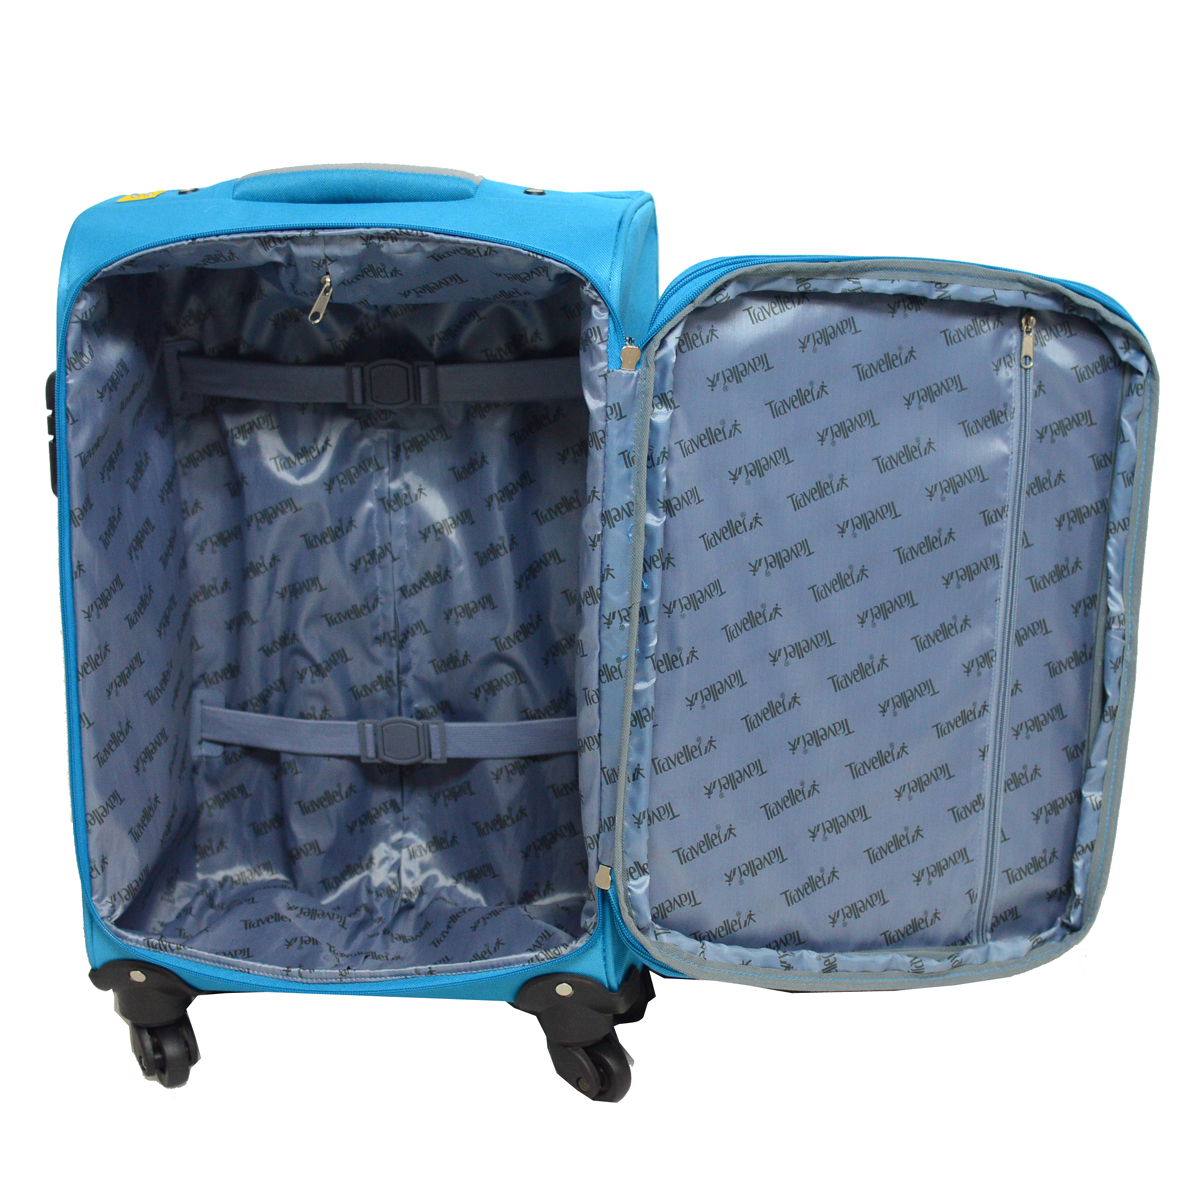 Expandable Expandable Trolley Luggage Set